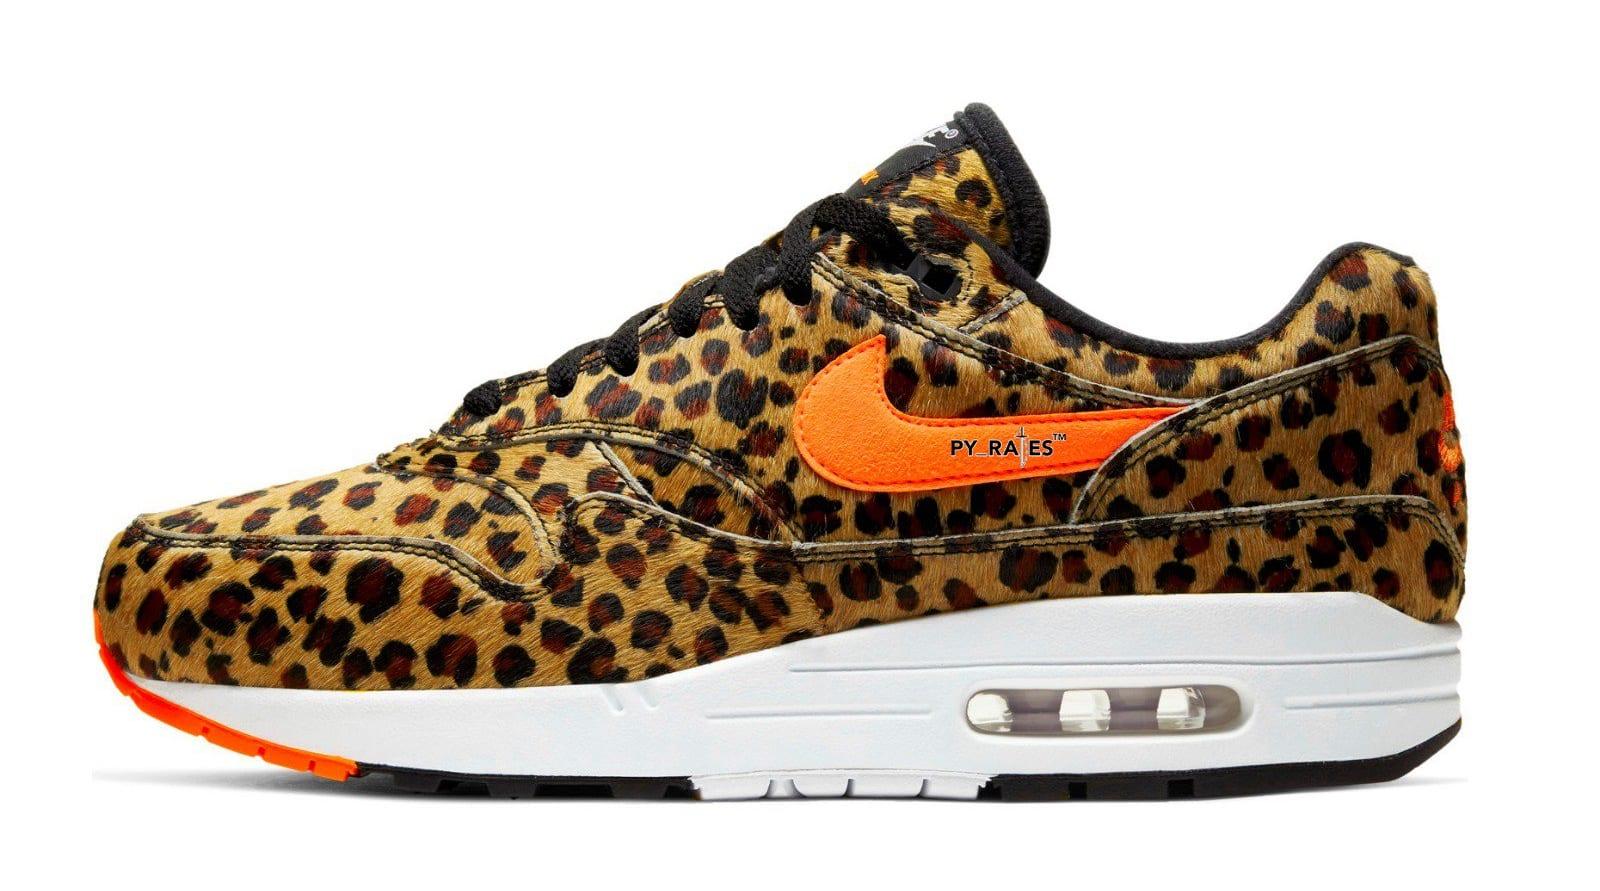 Colortotal 1 Max X Air Orange' 3 Nike Aq0928 'multi 0 Animal Atmos rdQths